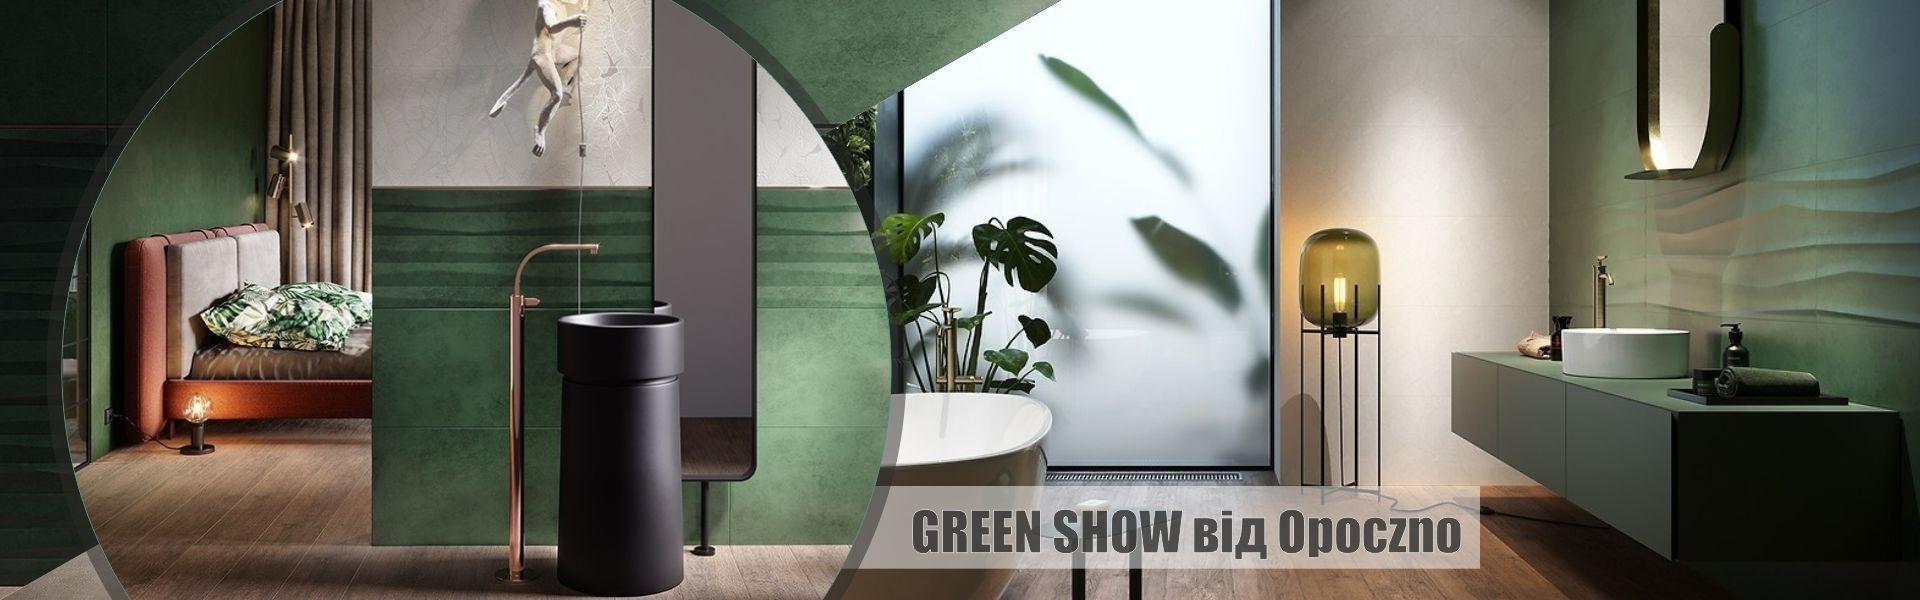 Green show